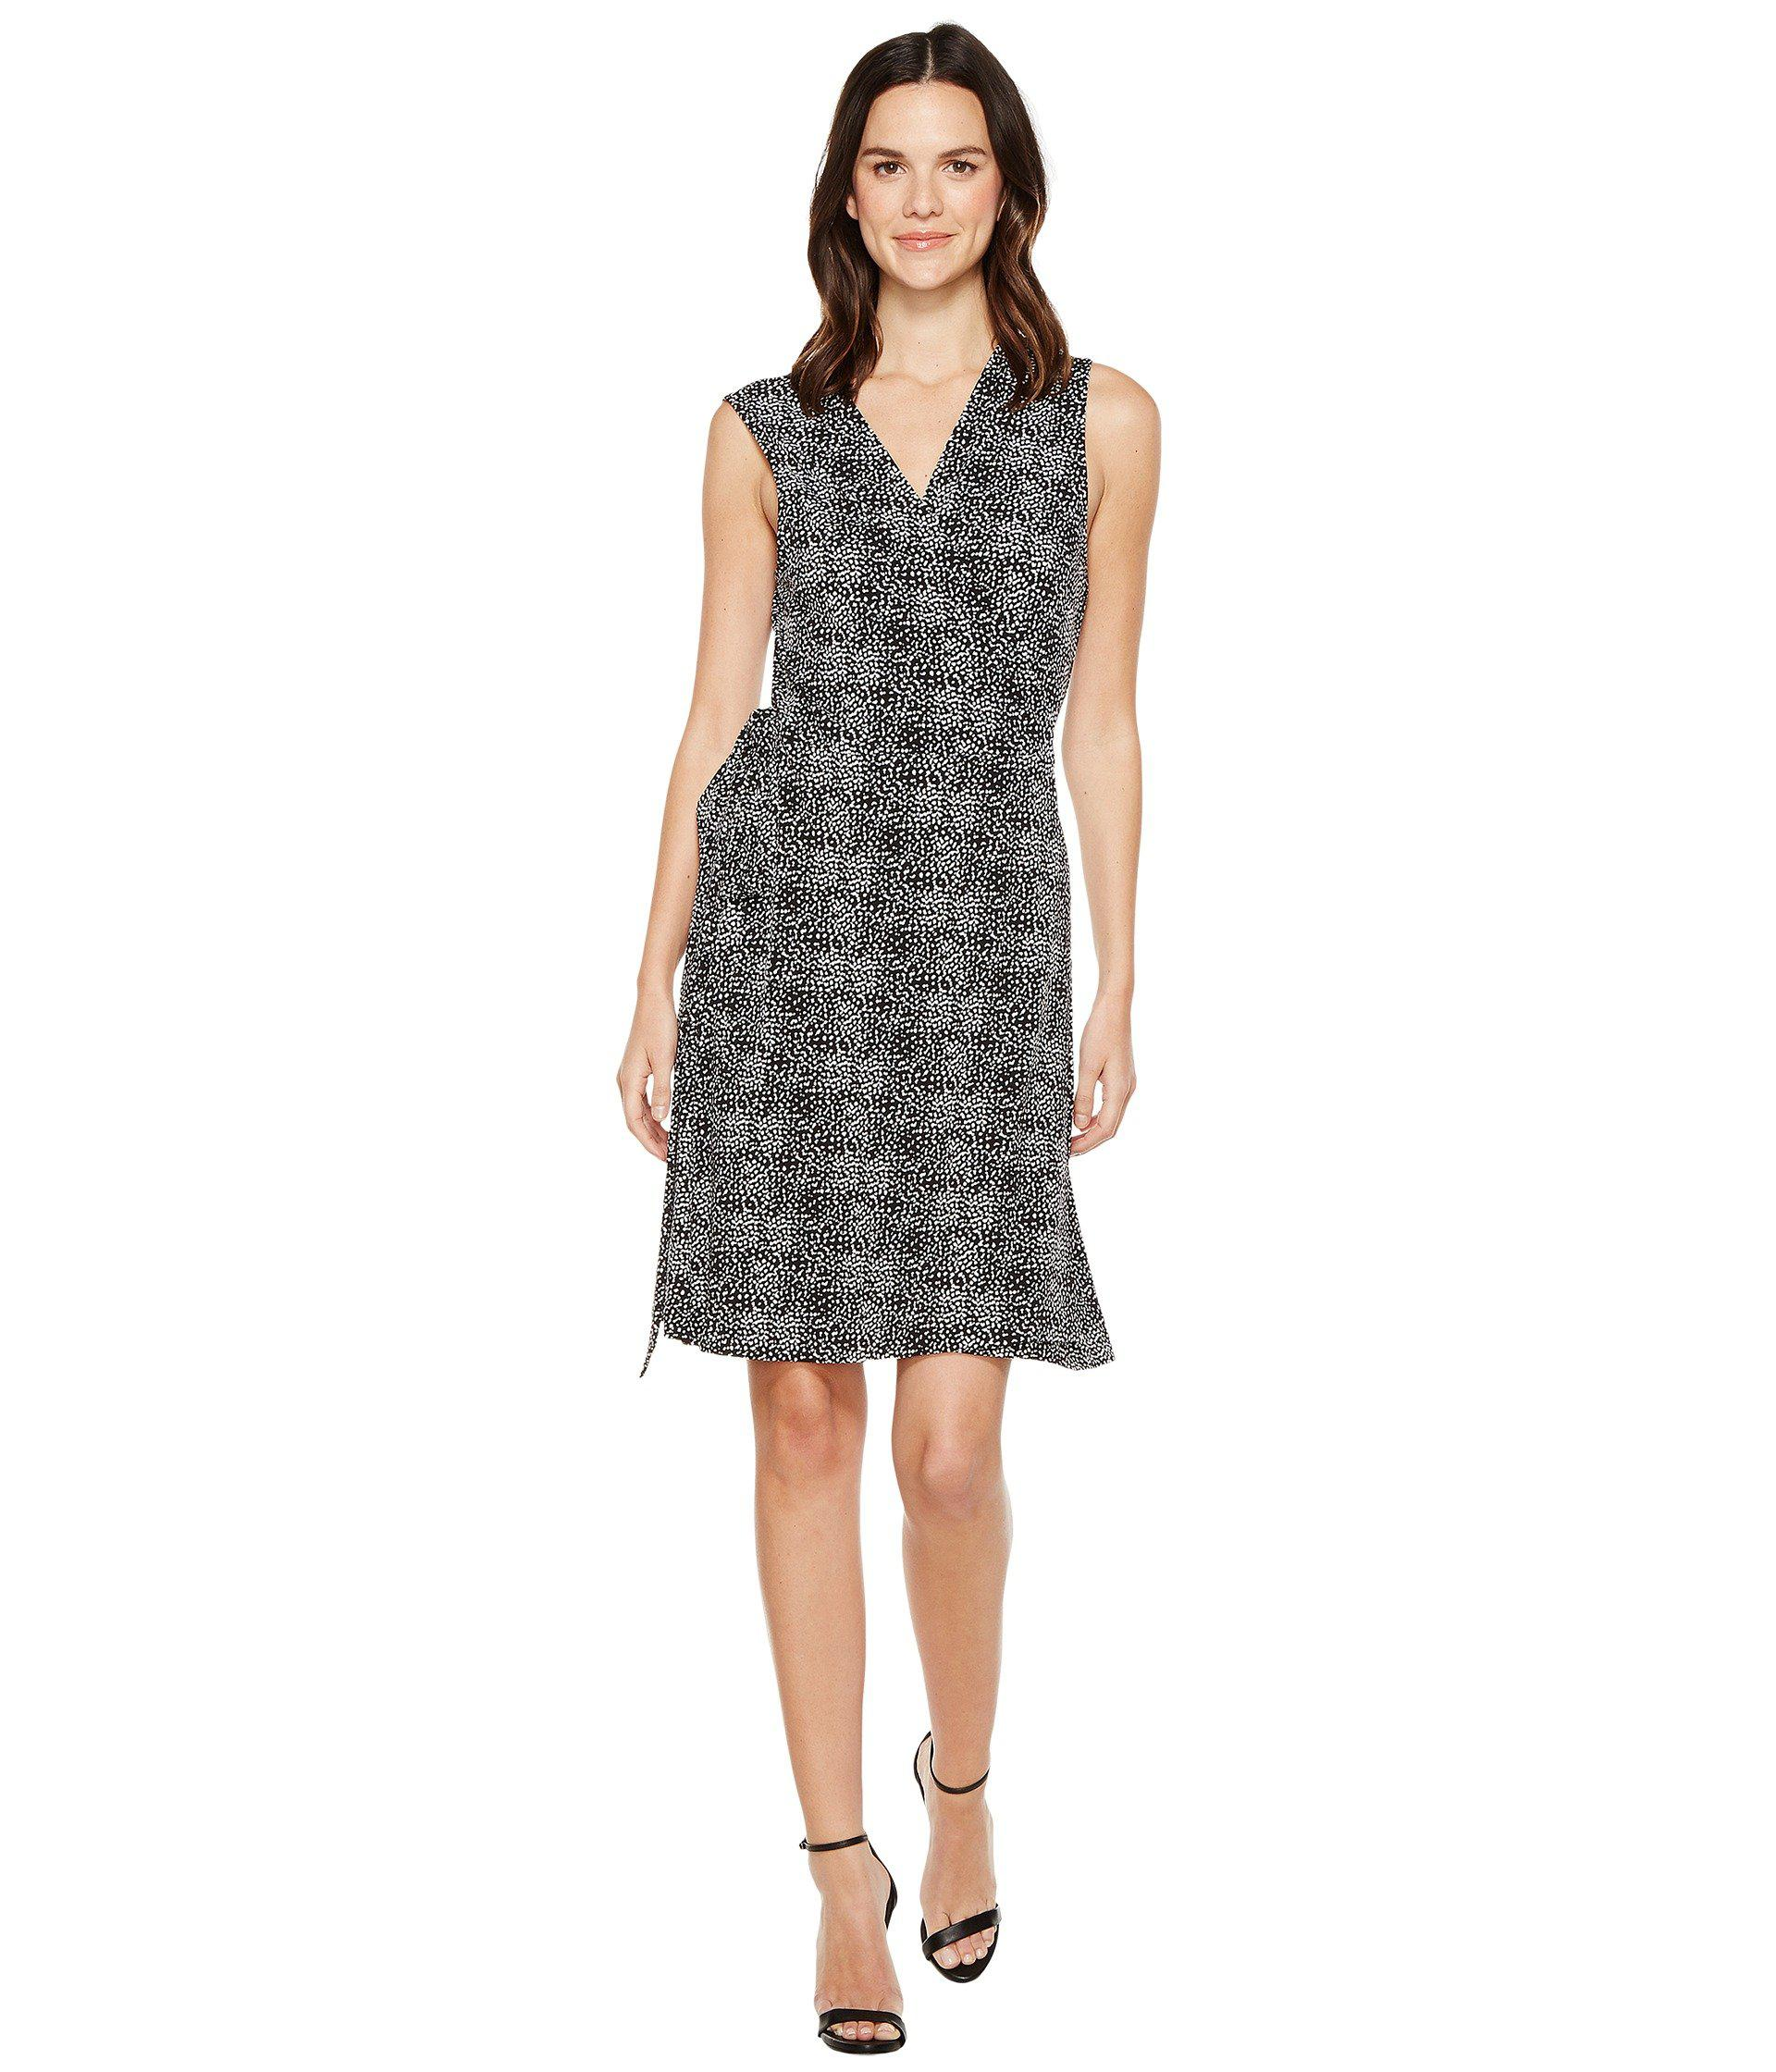 ea66836e848 Lyst - Vince Camuto Pebble Print Wrap Dress in Black - Save 36%